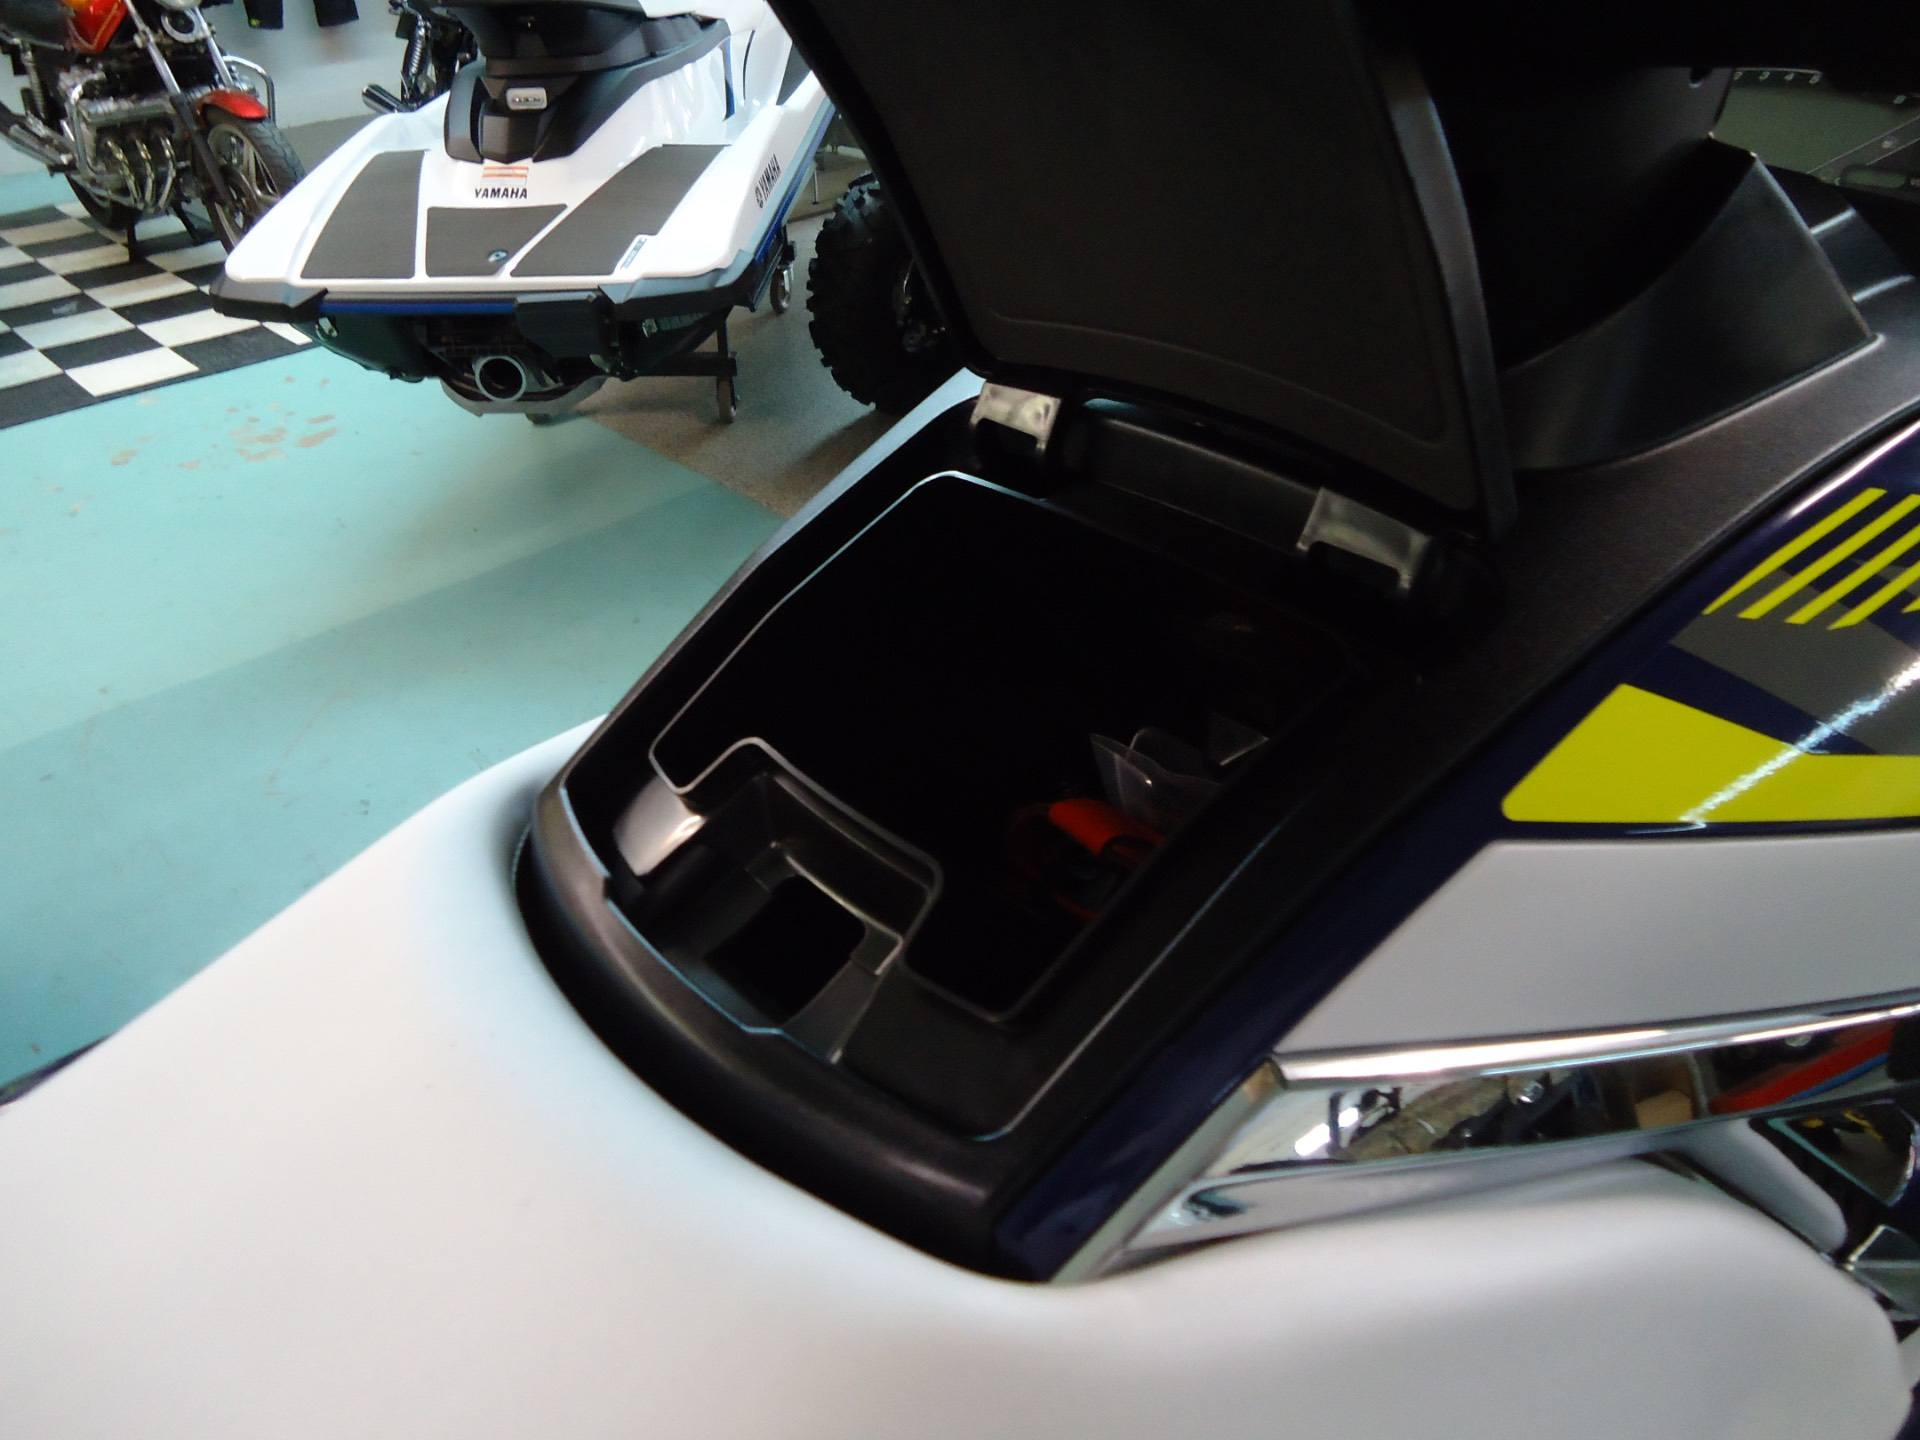 2017 Yamaha VX Deluxe 8